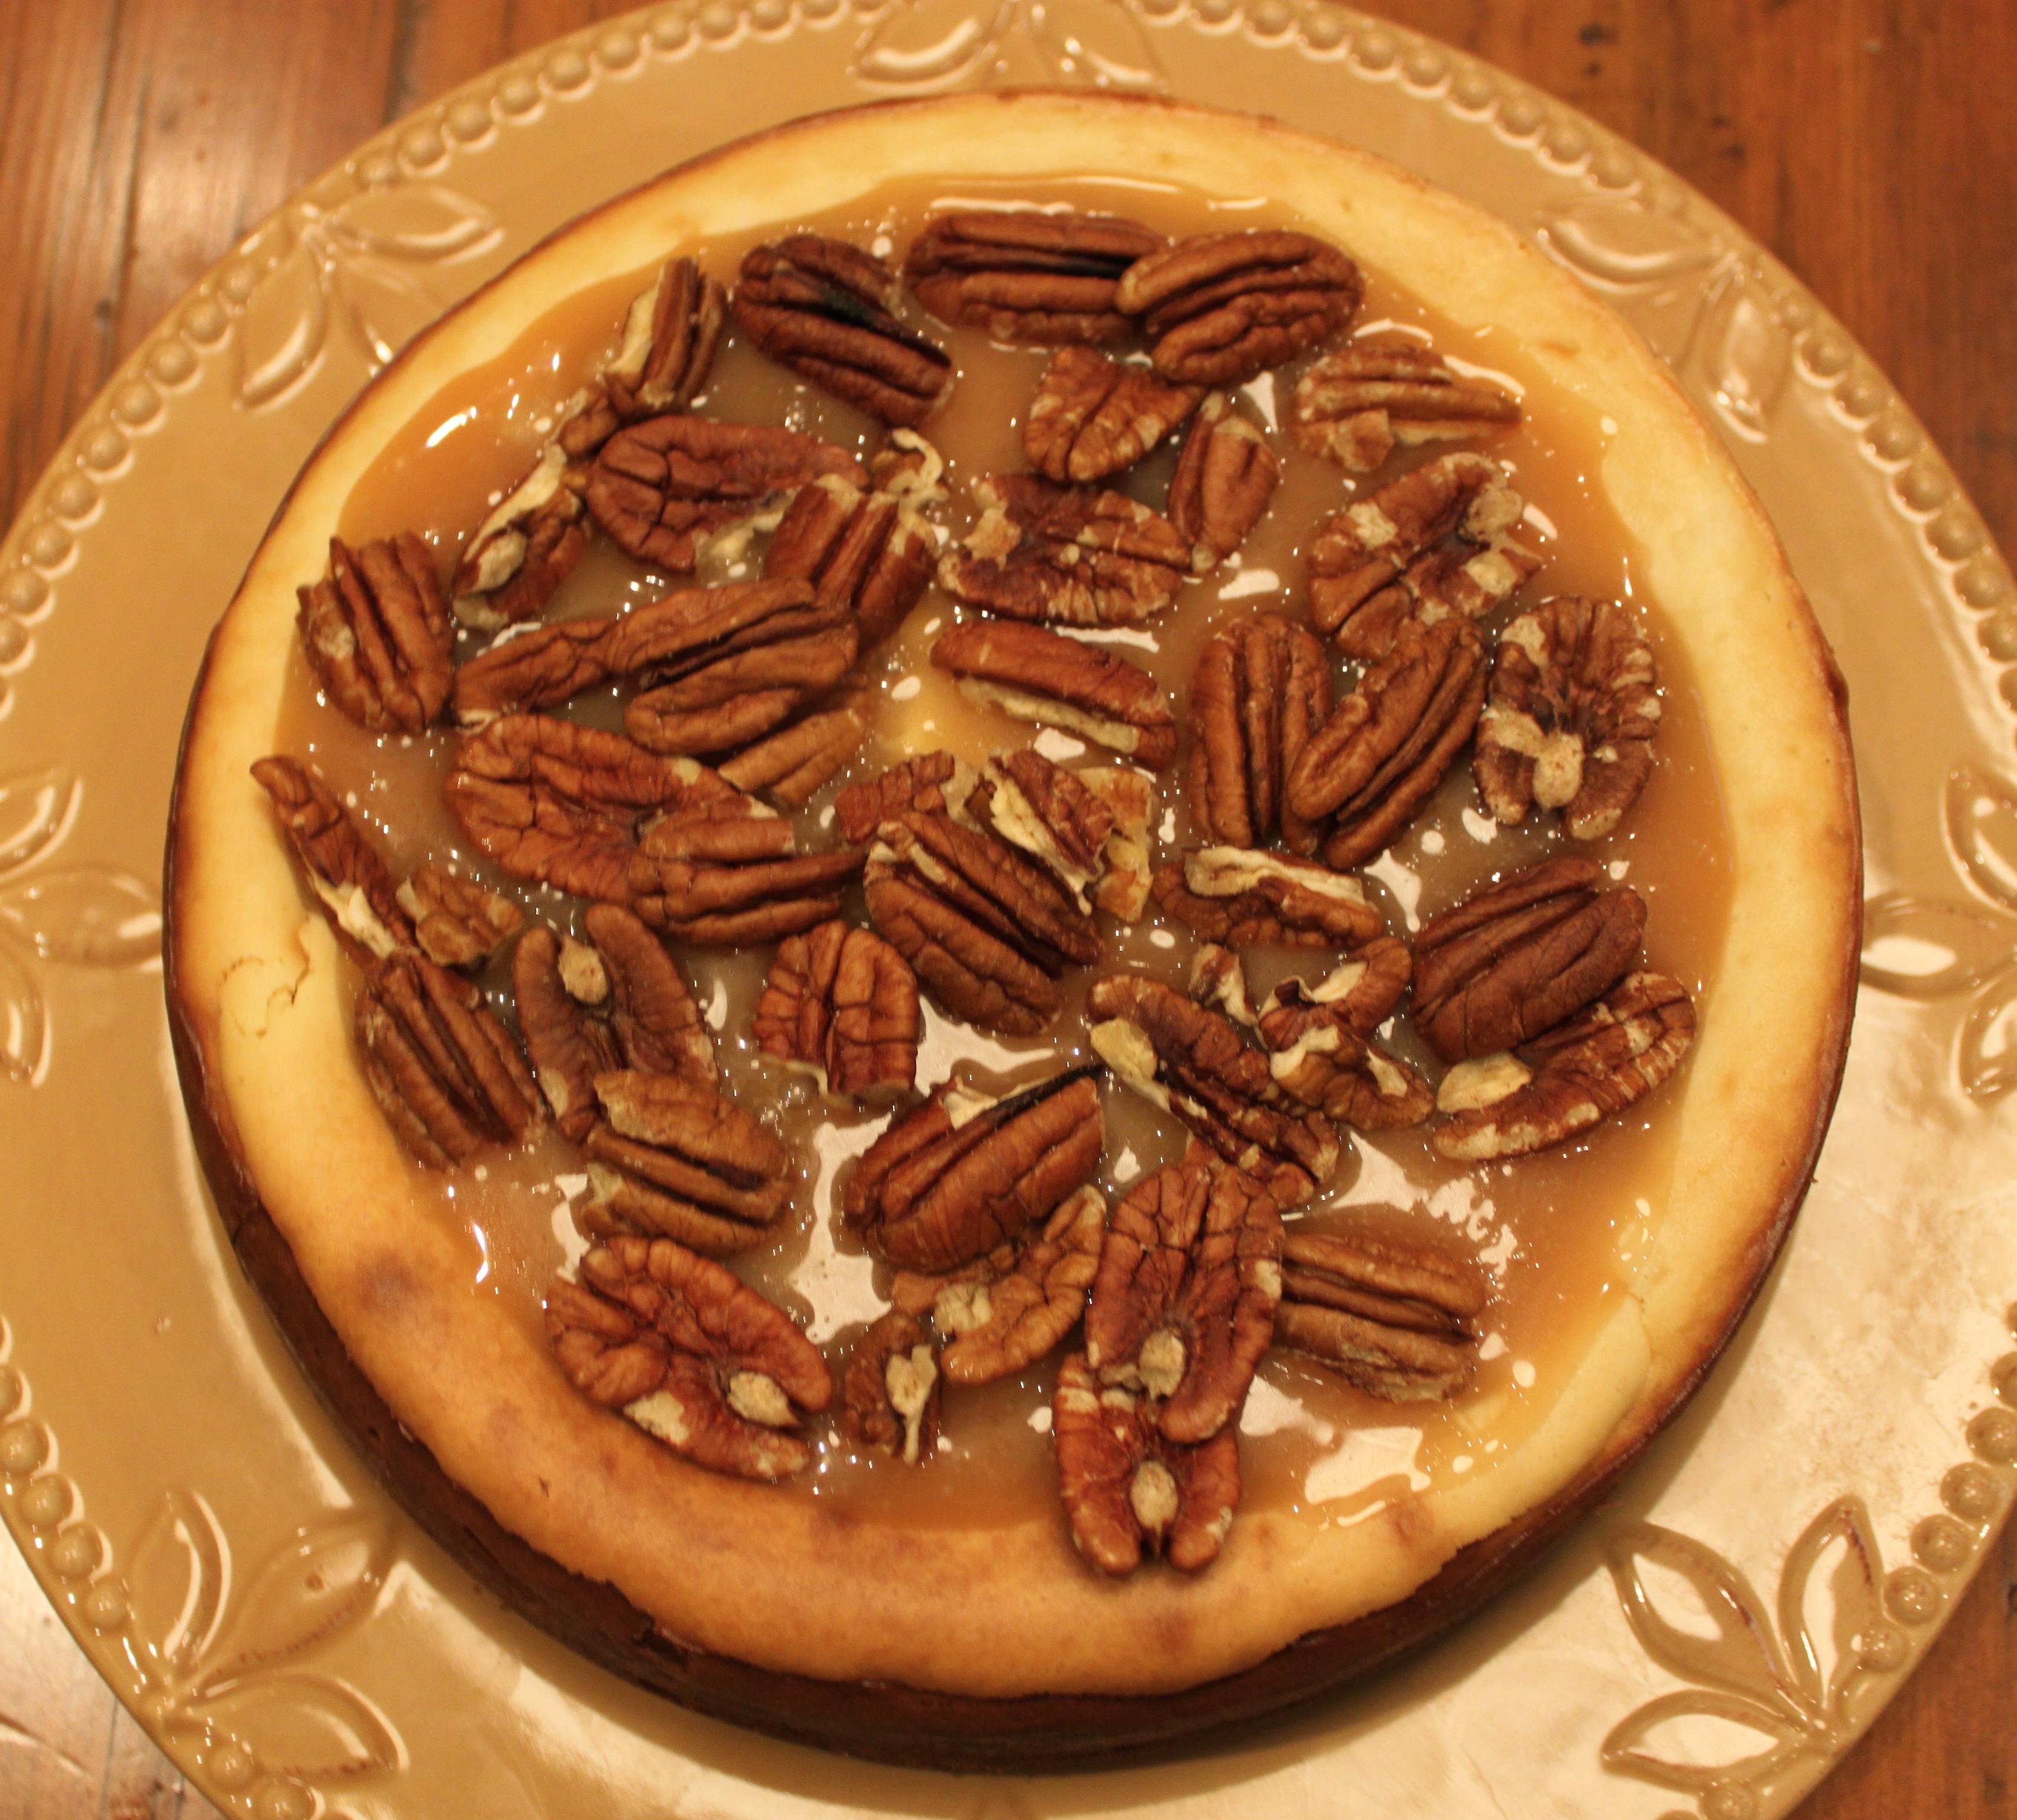 Very popular images: Caramel Pecan Cheesecake